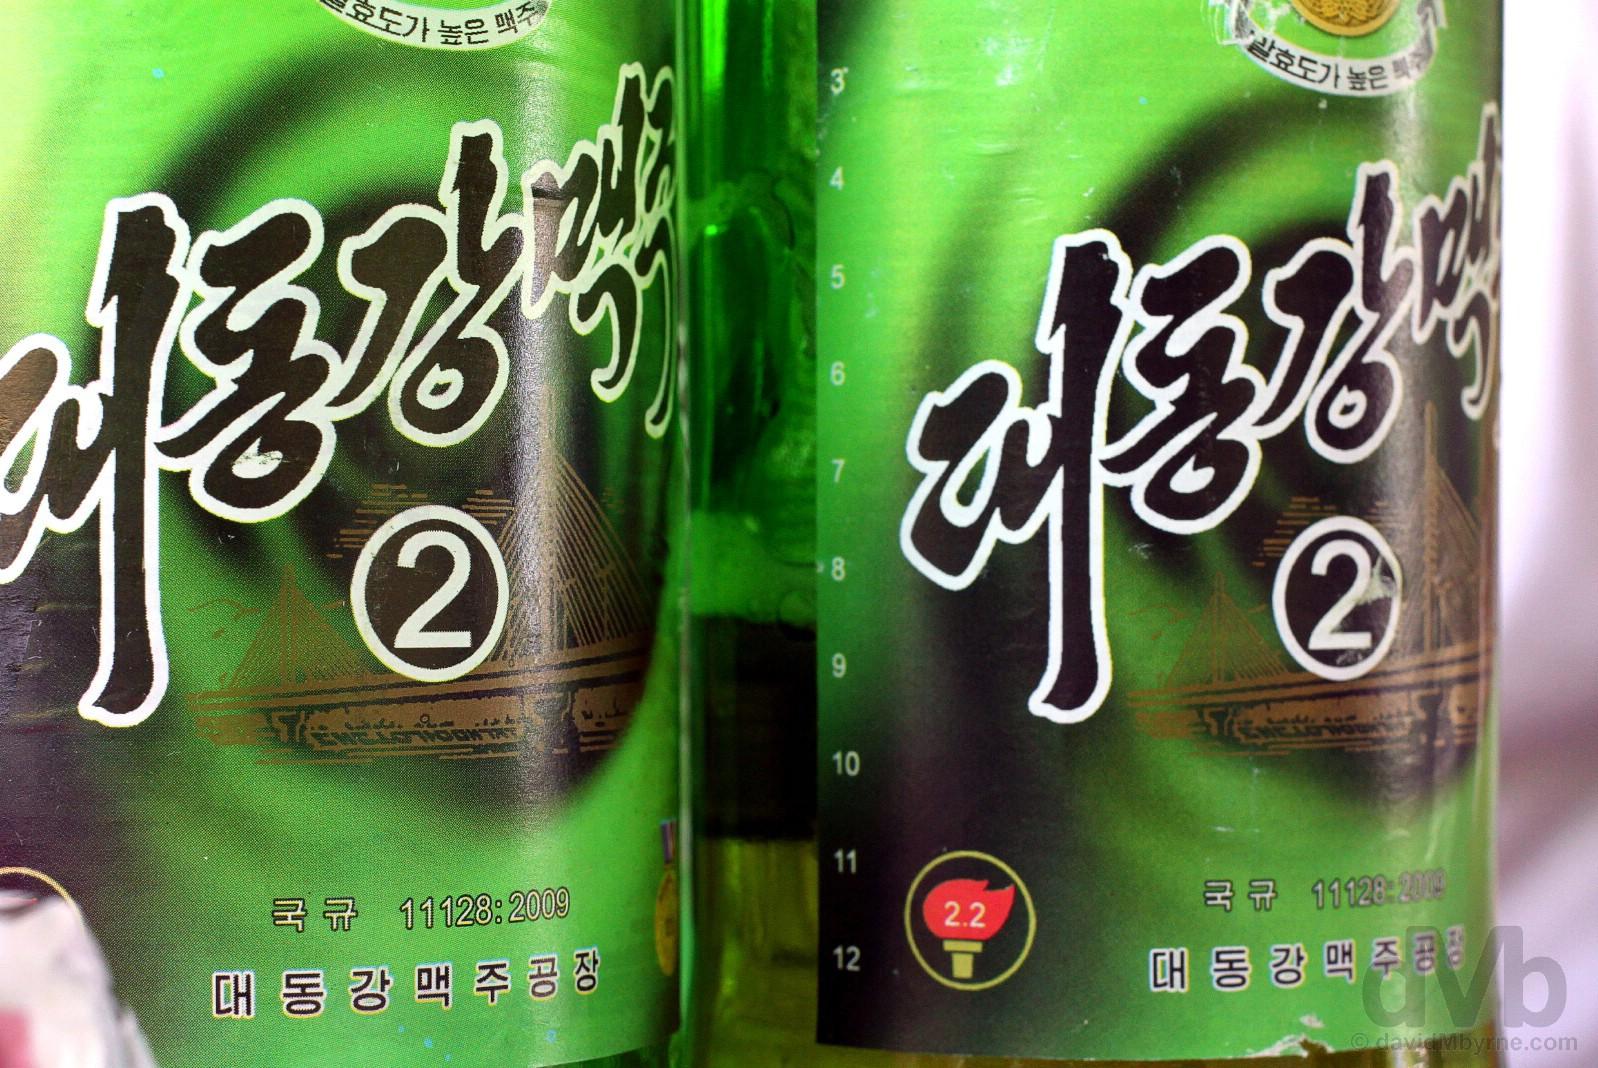 North Korea beer - Worldwide Destination Photography & Insights